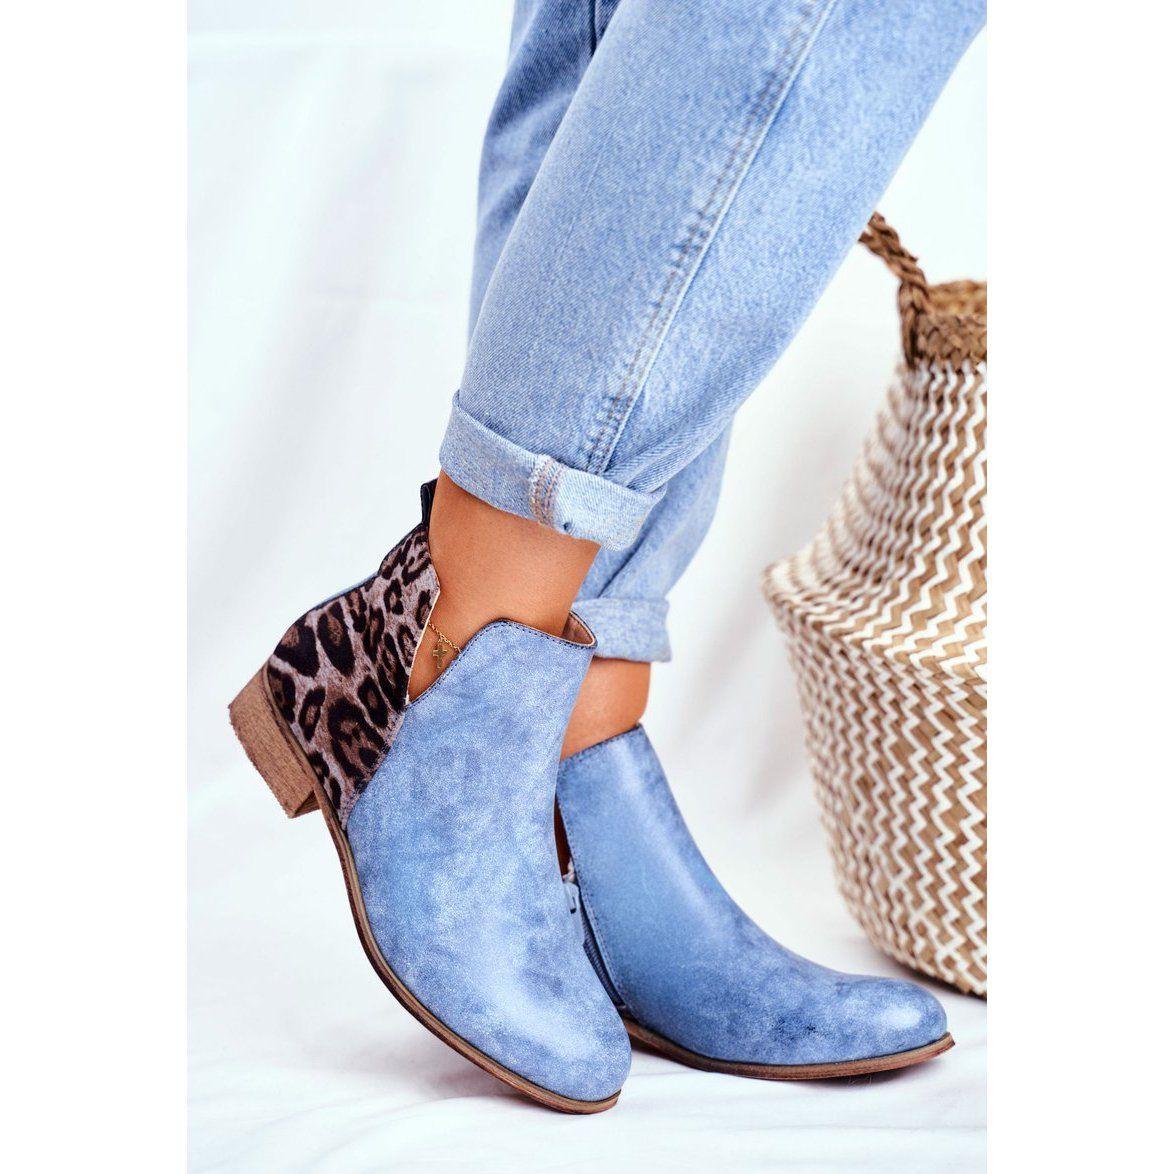 Eve Botki Damskie Plaski Obcas Wiosenne Niebieskie Viva Chelsea Boots Ankle Boot Shoes